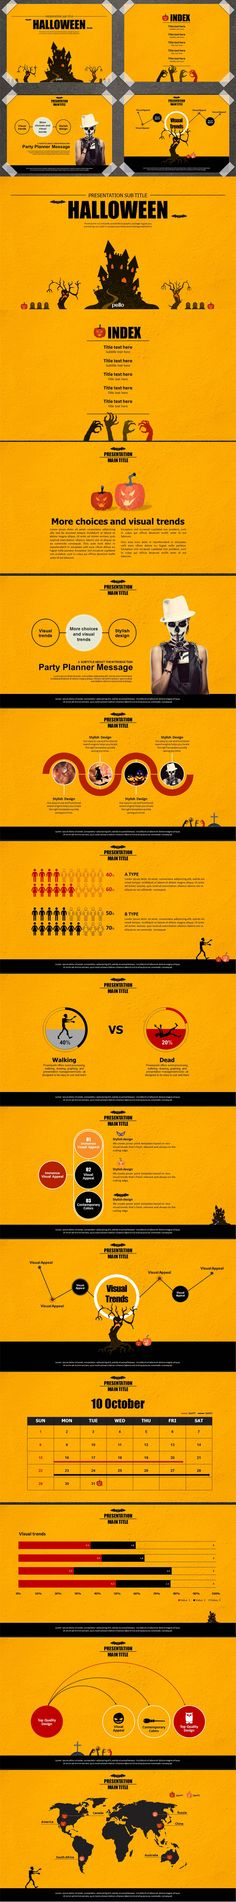 Halloween Presentation Use Powerpoint, Keynote  http://keynotor.blogspot.kr/